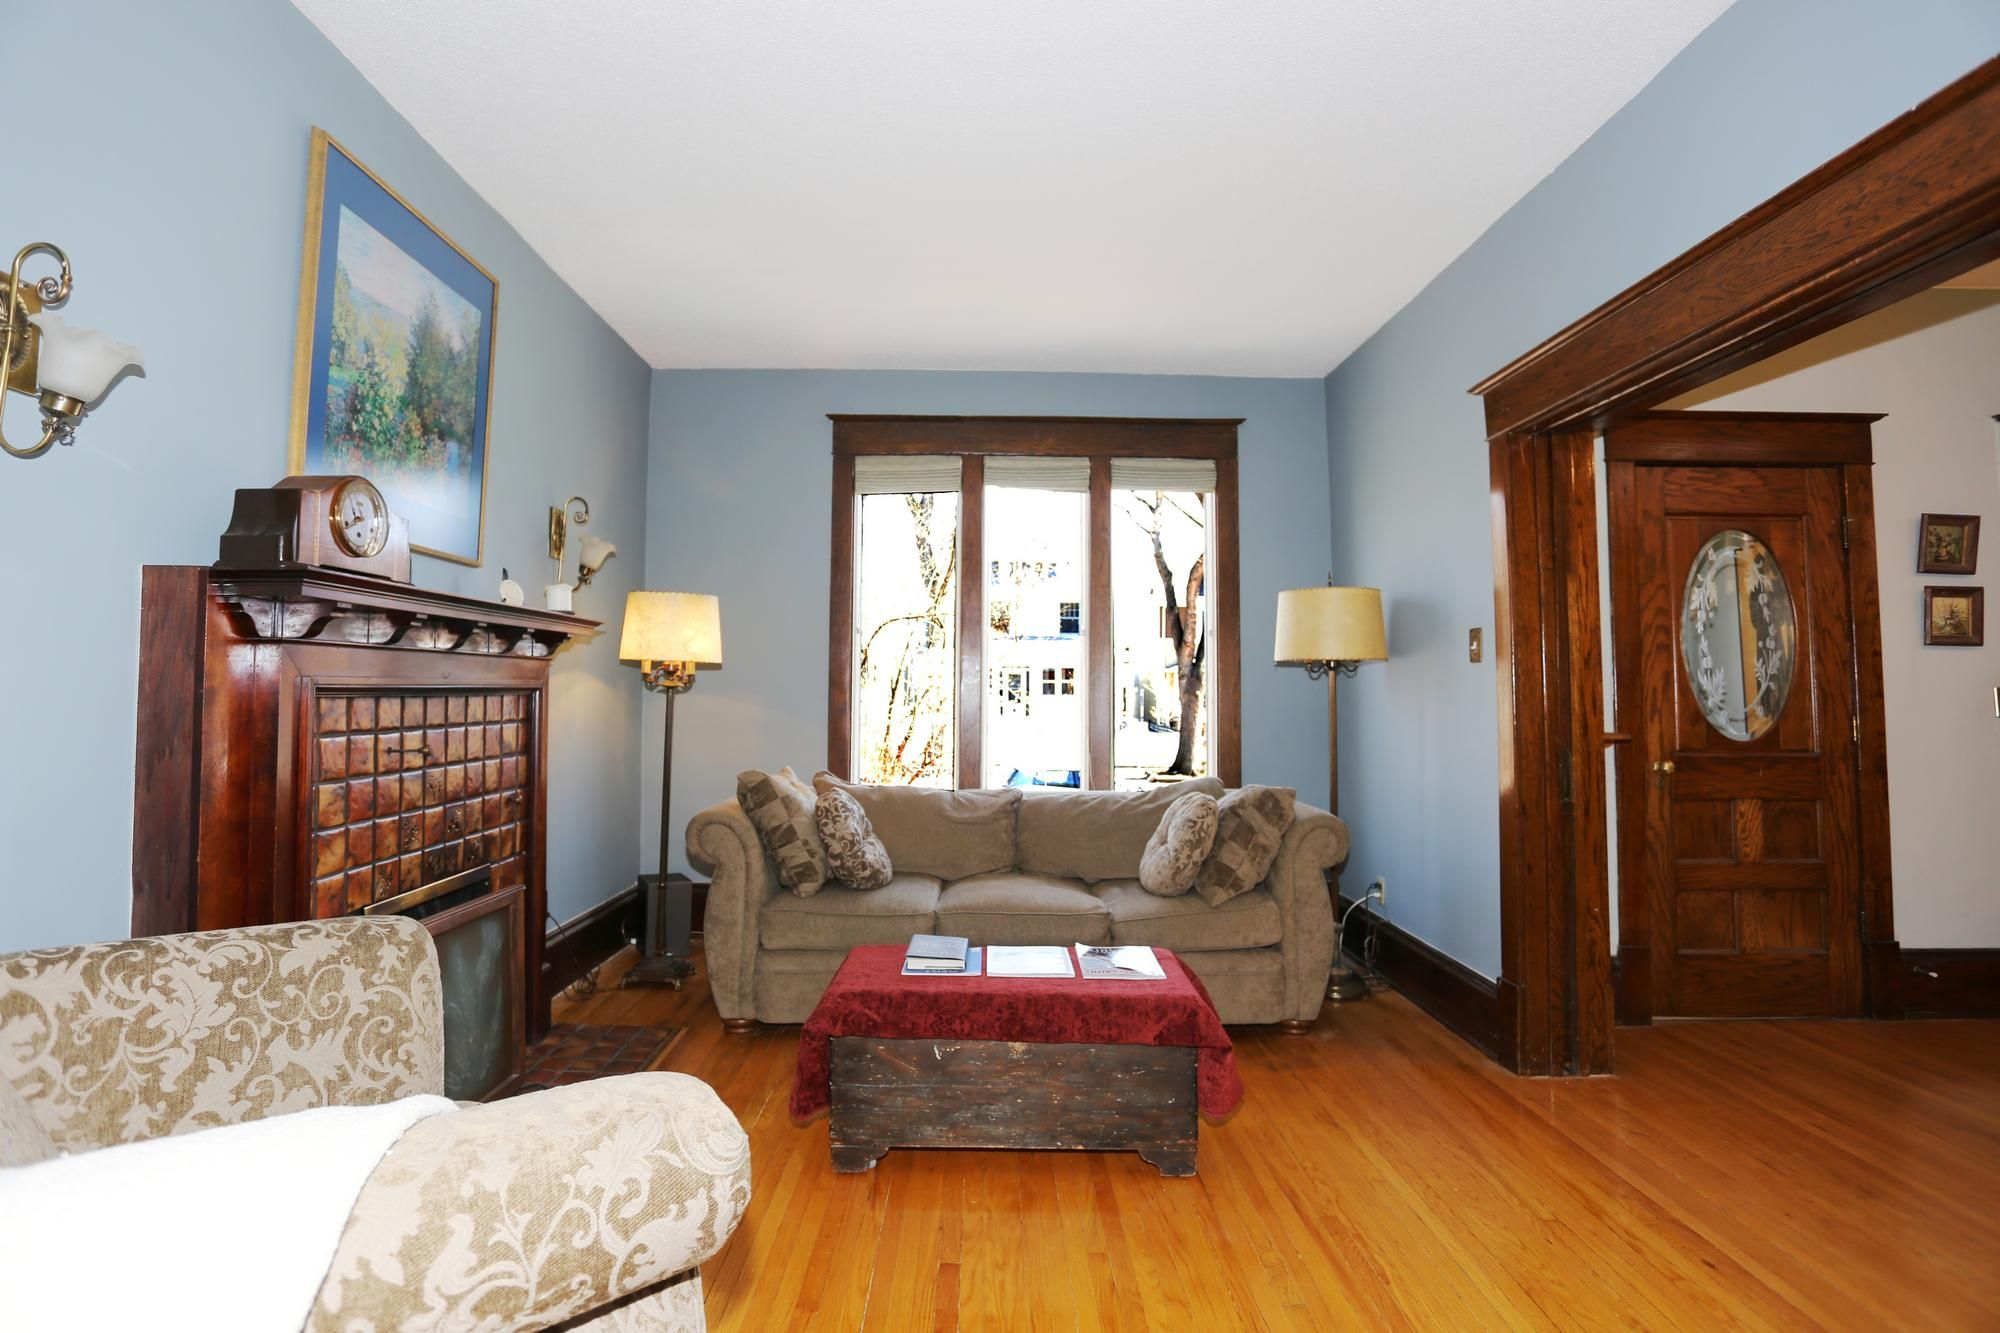 Photo 5: Photos: 96 Home Street in Winnipeg: Wolseley Single Family Detached for sale (5B)  : MLS®# 1810985